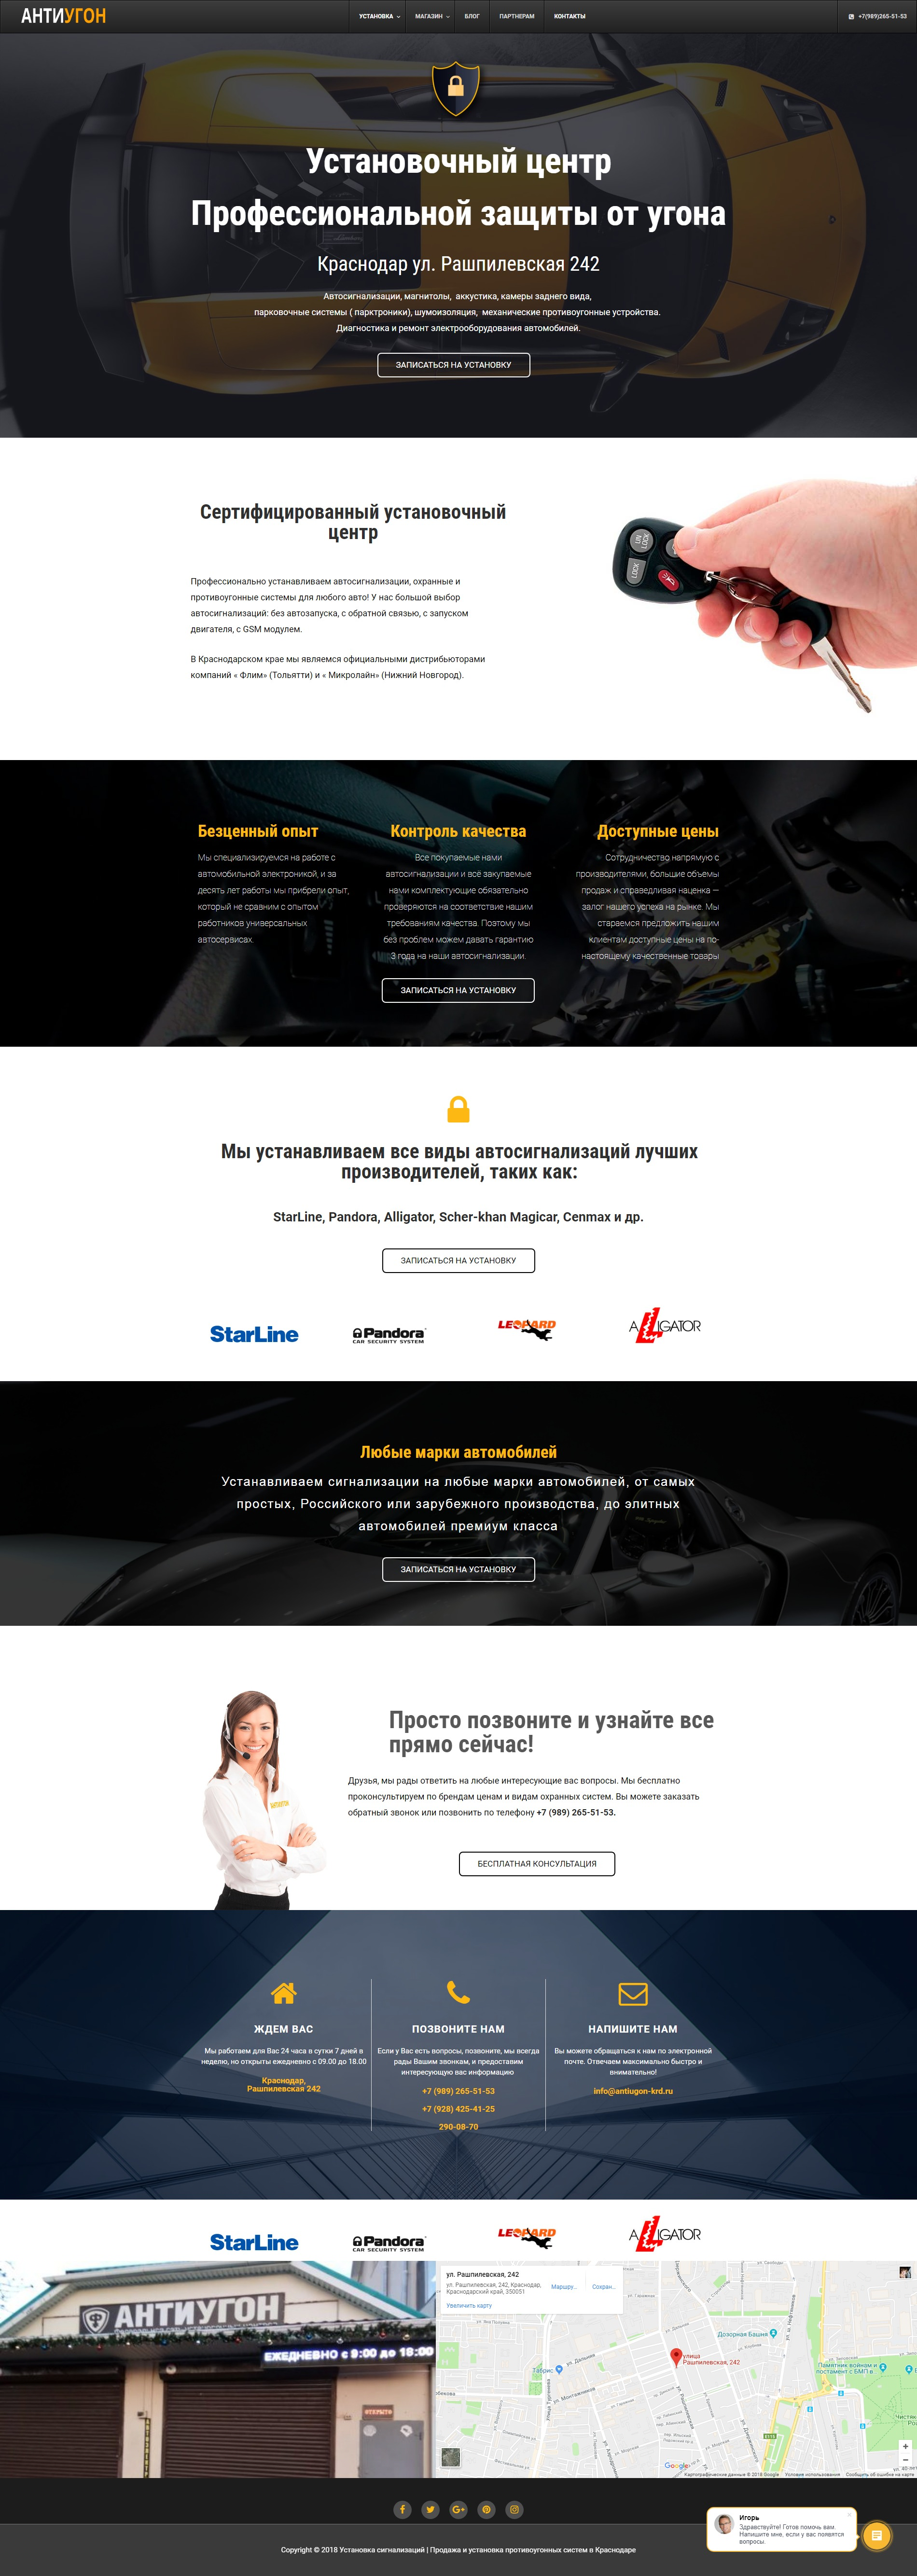 screencapture-antiugon-krd-ru-2018-06-24-11_26_35